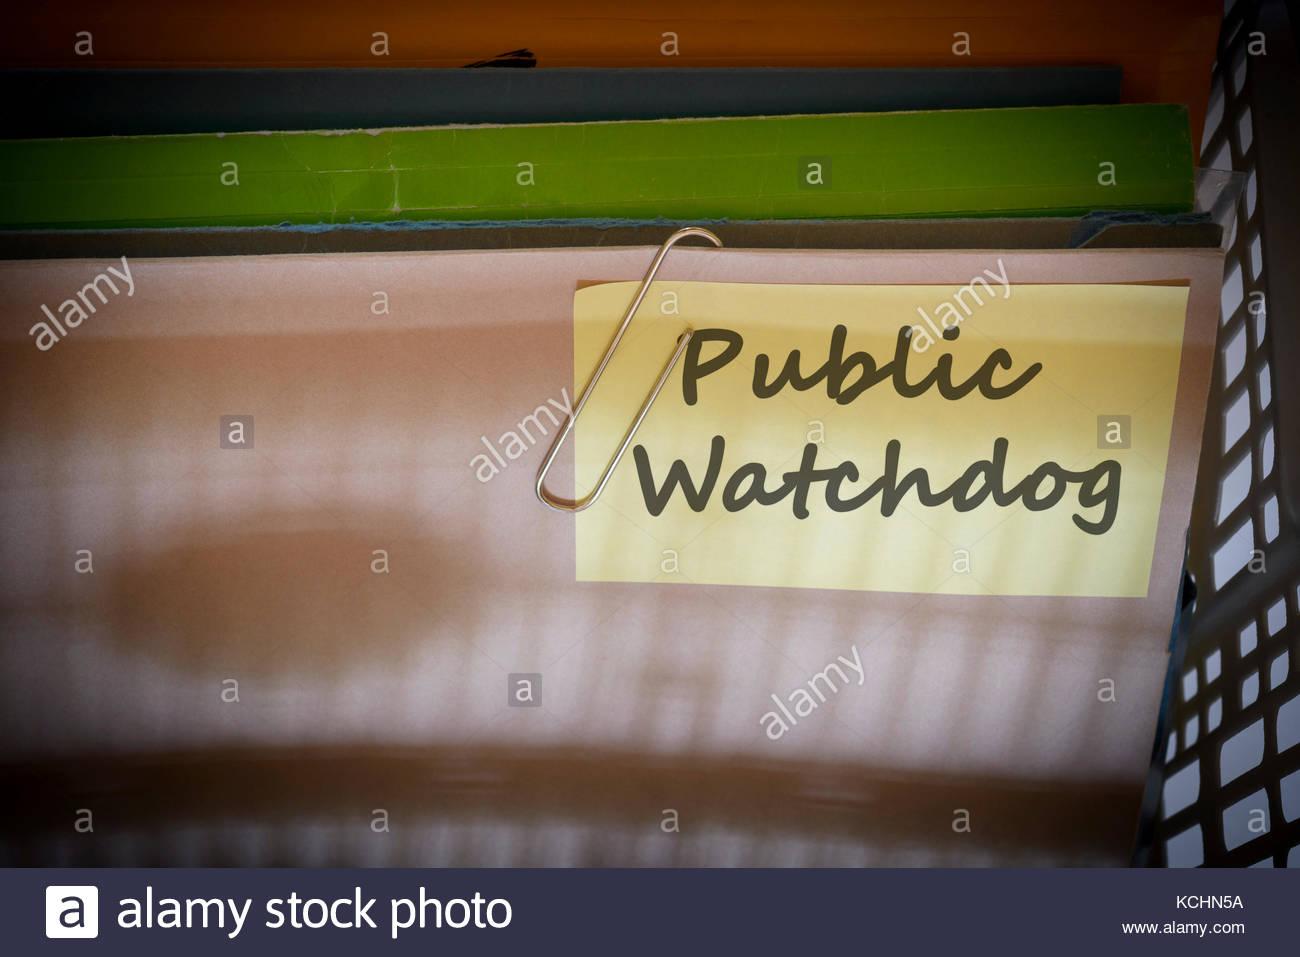 Public Watchdog written on document folder, Dorset, England. - Stock Image